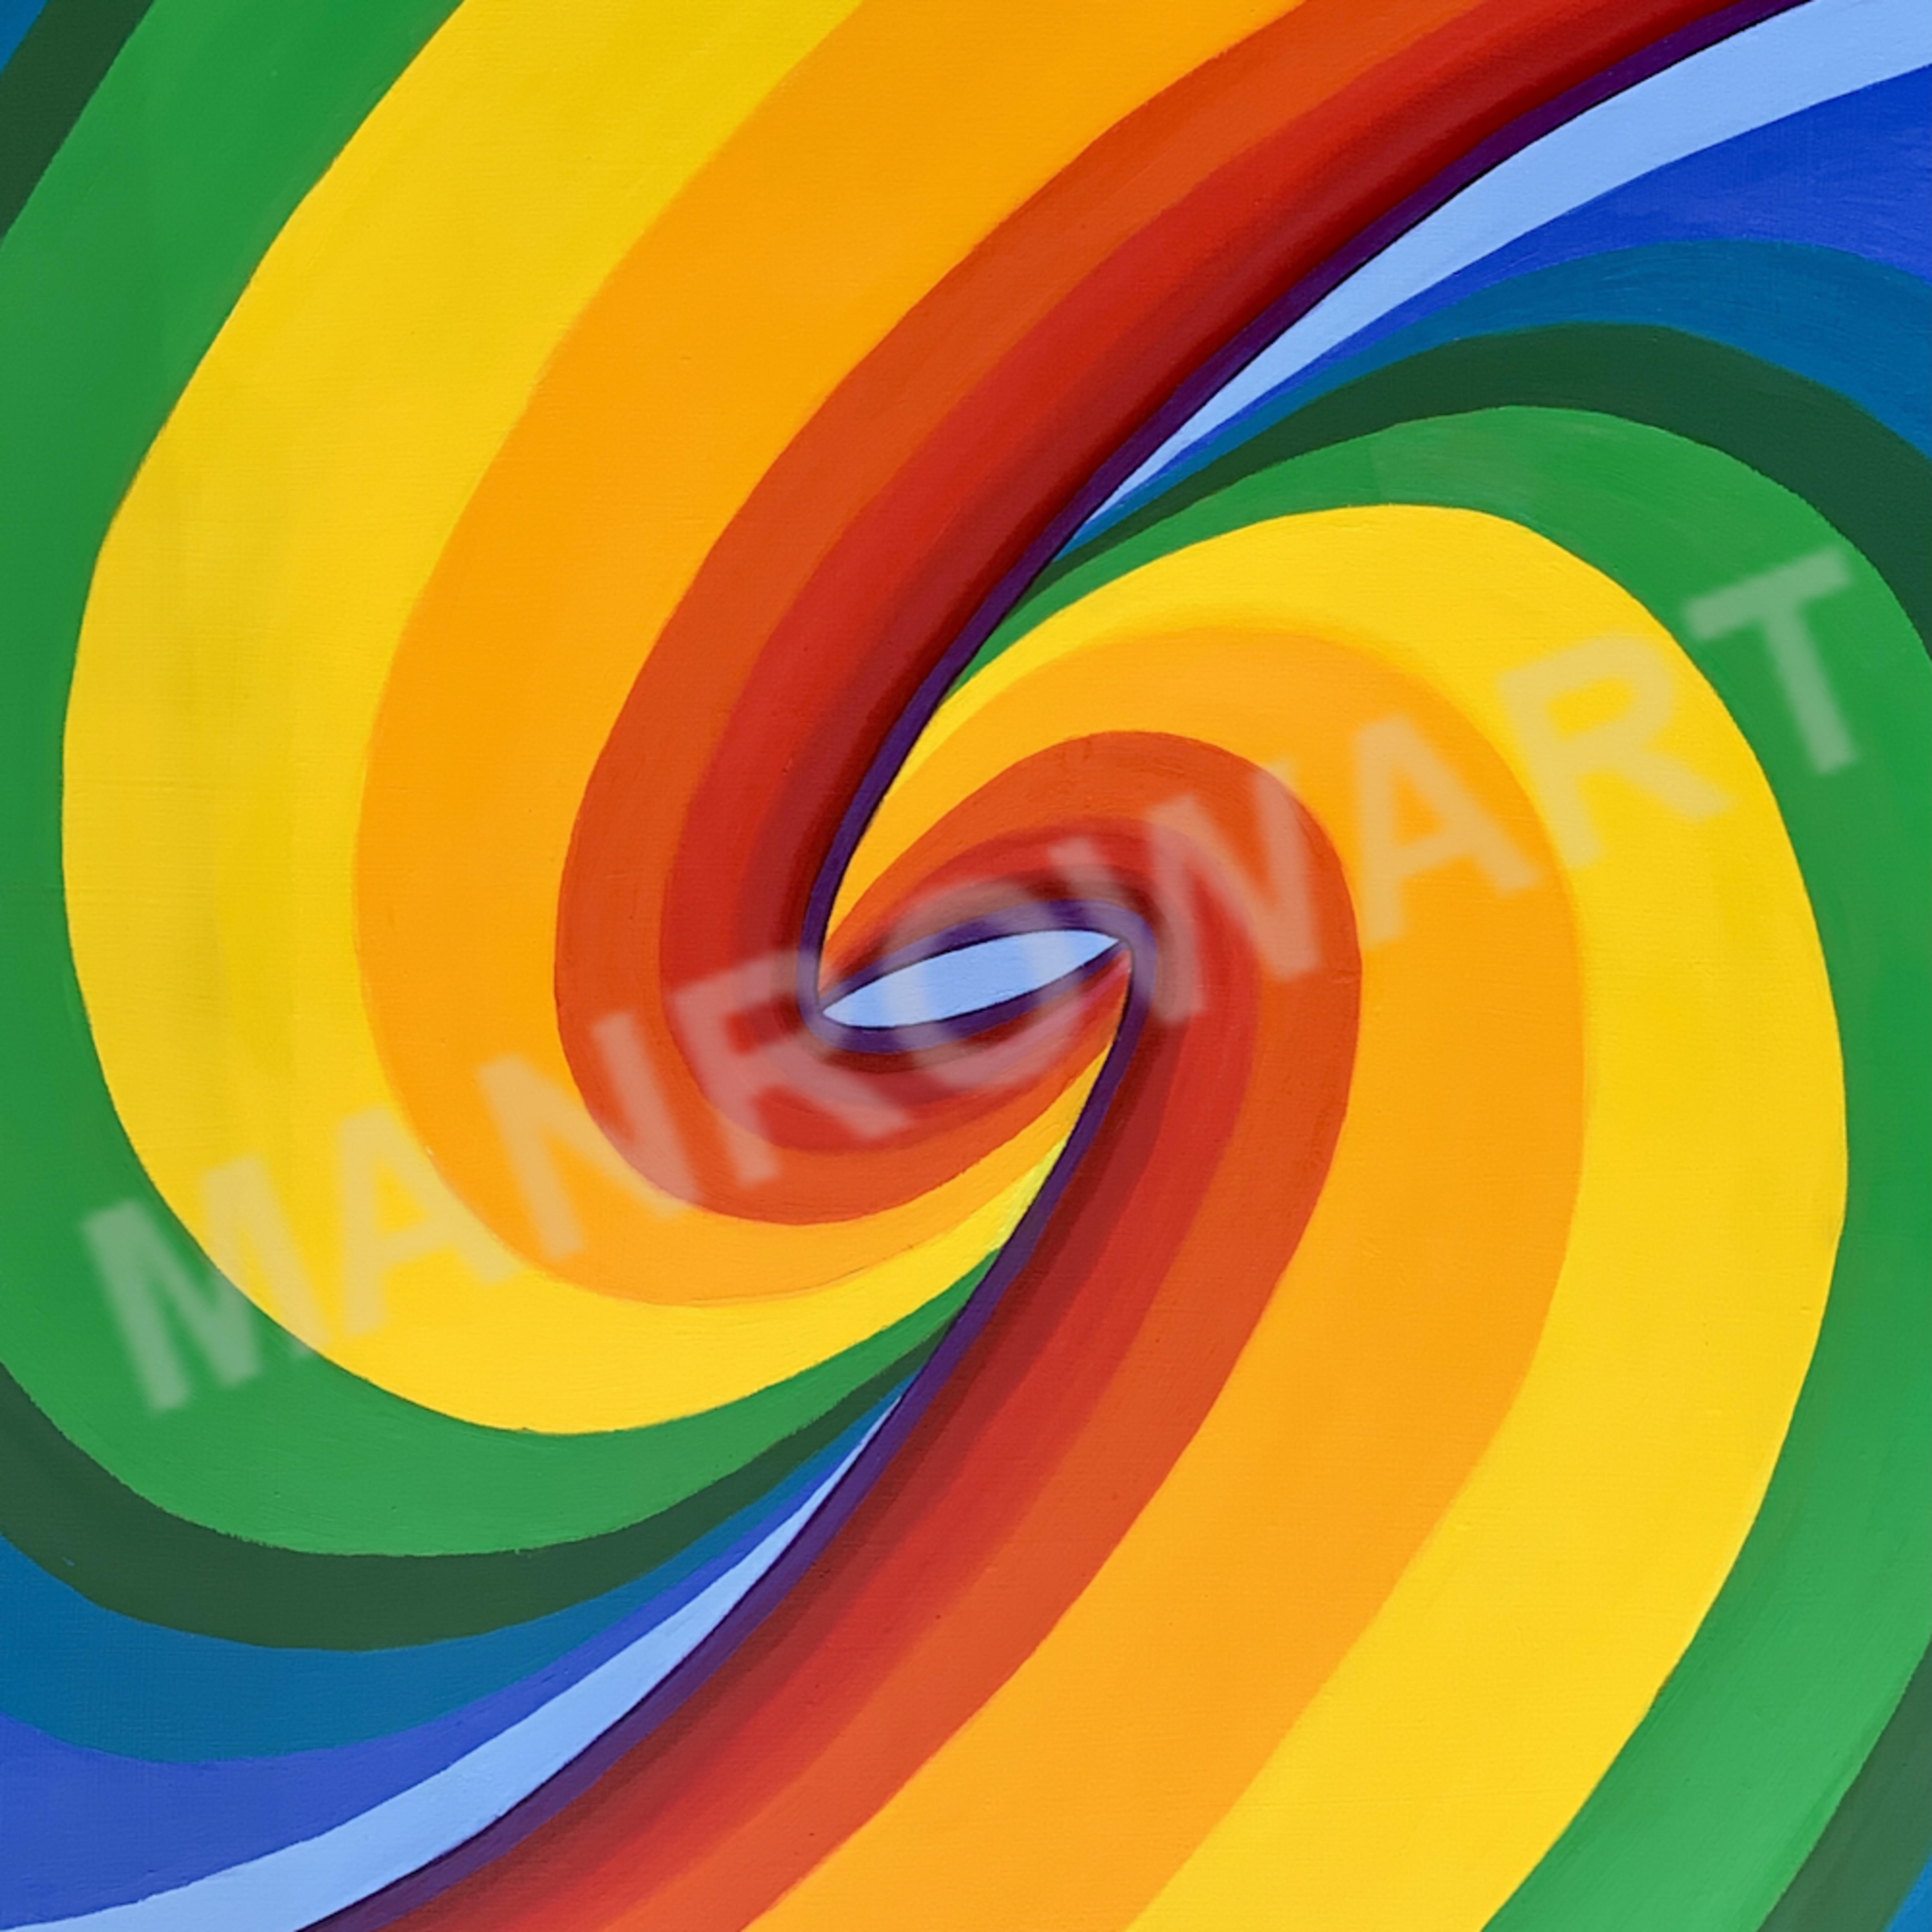 Rainbowrtlfv efsrvx